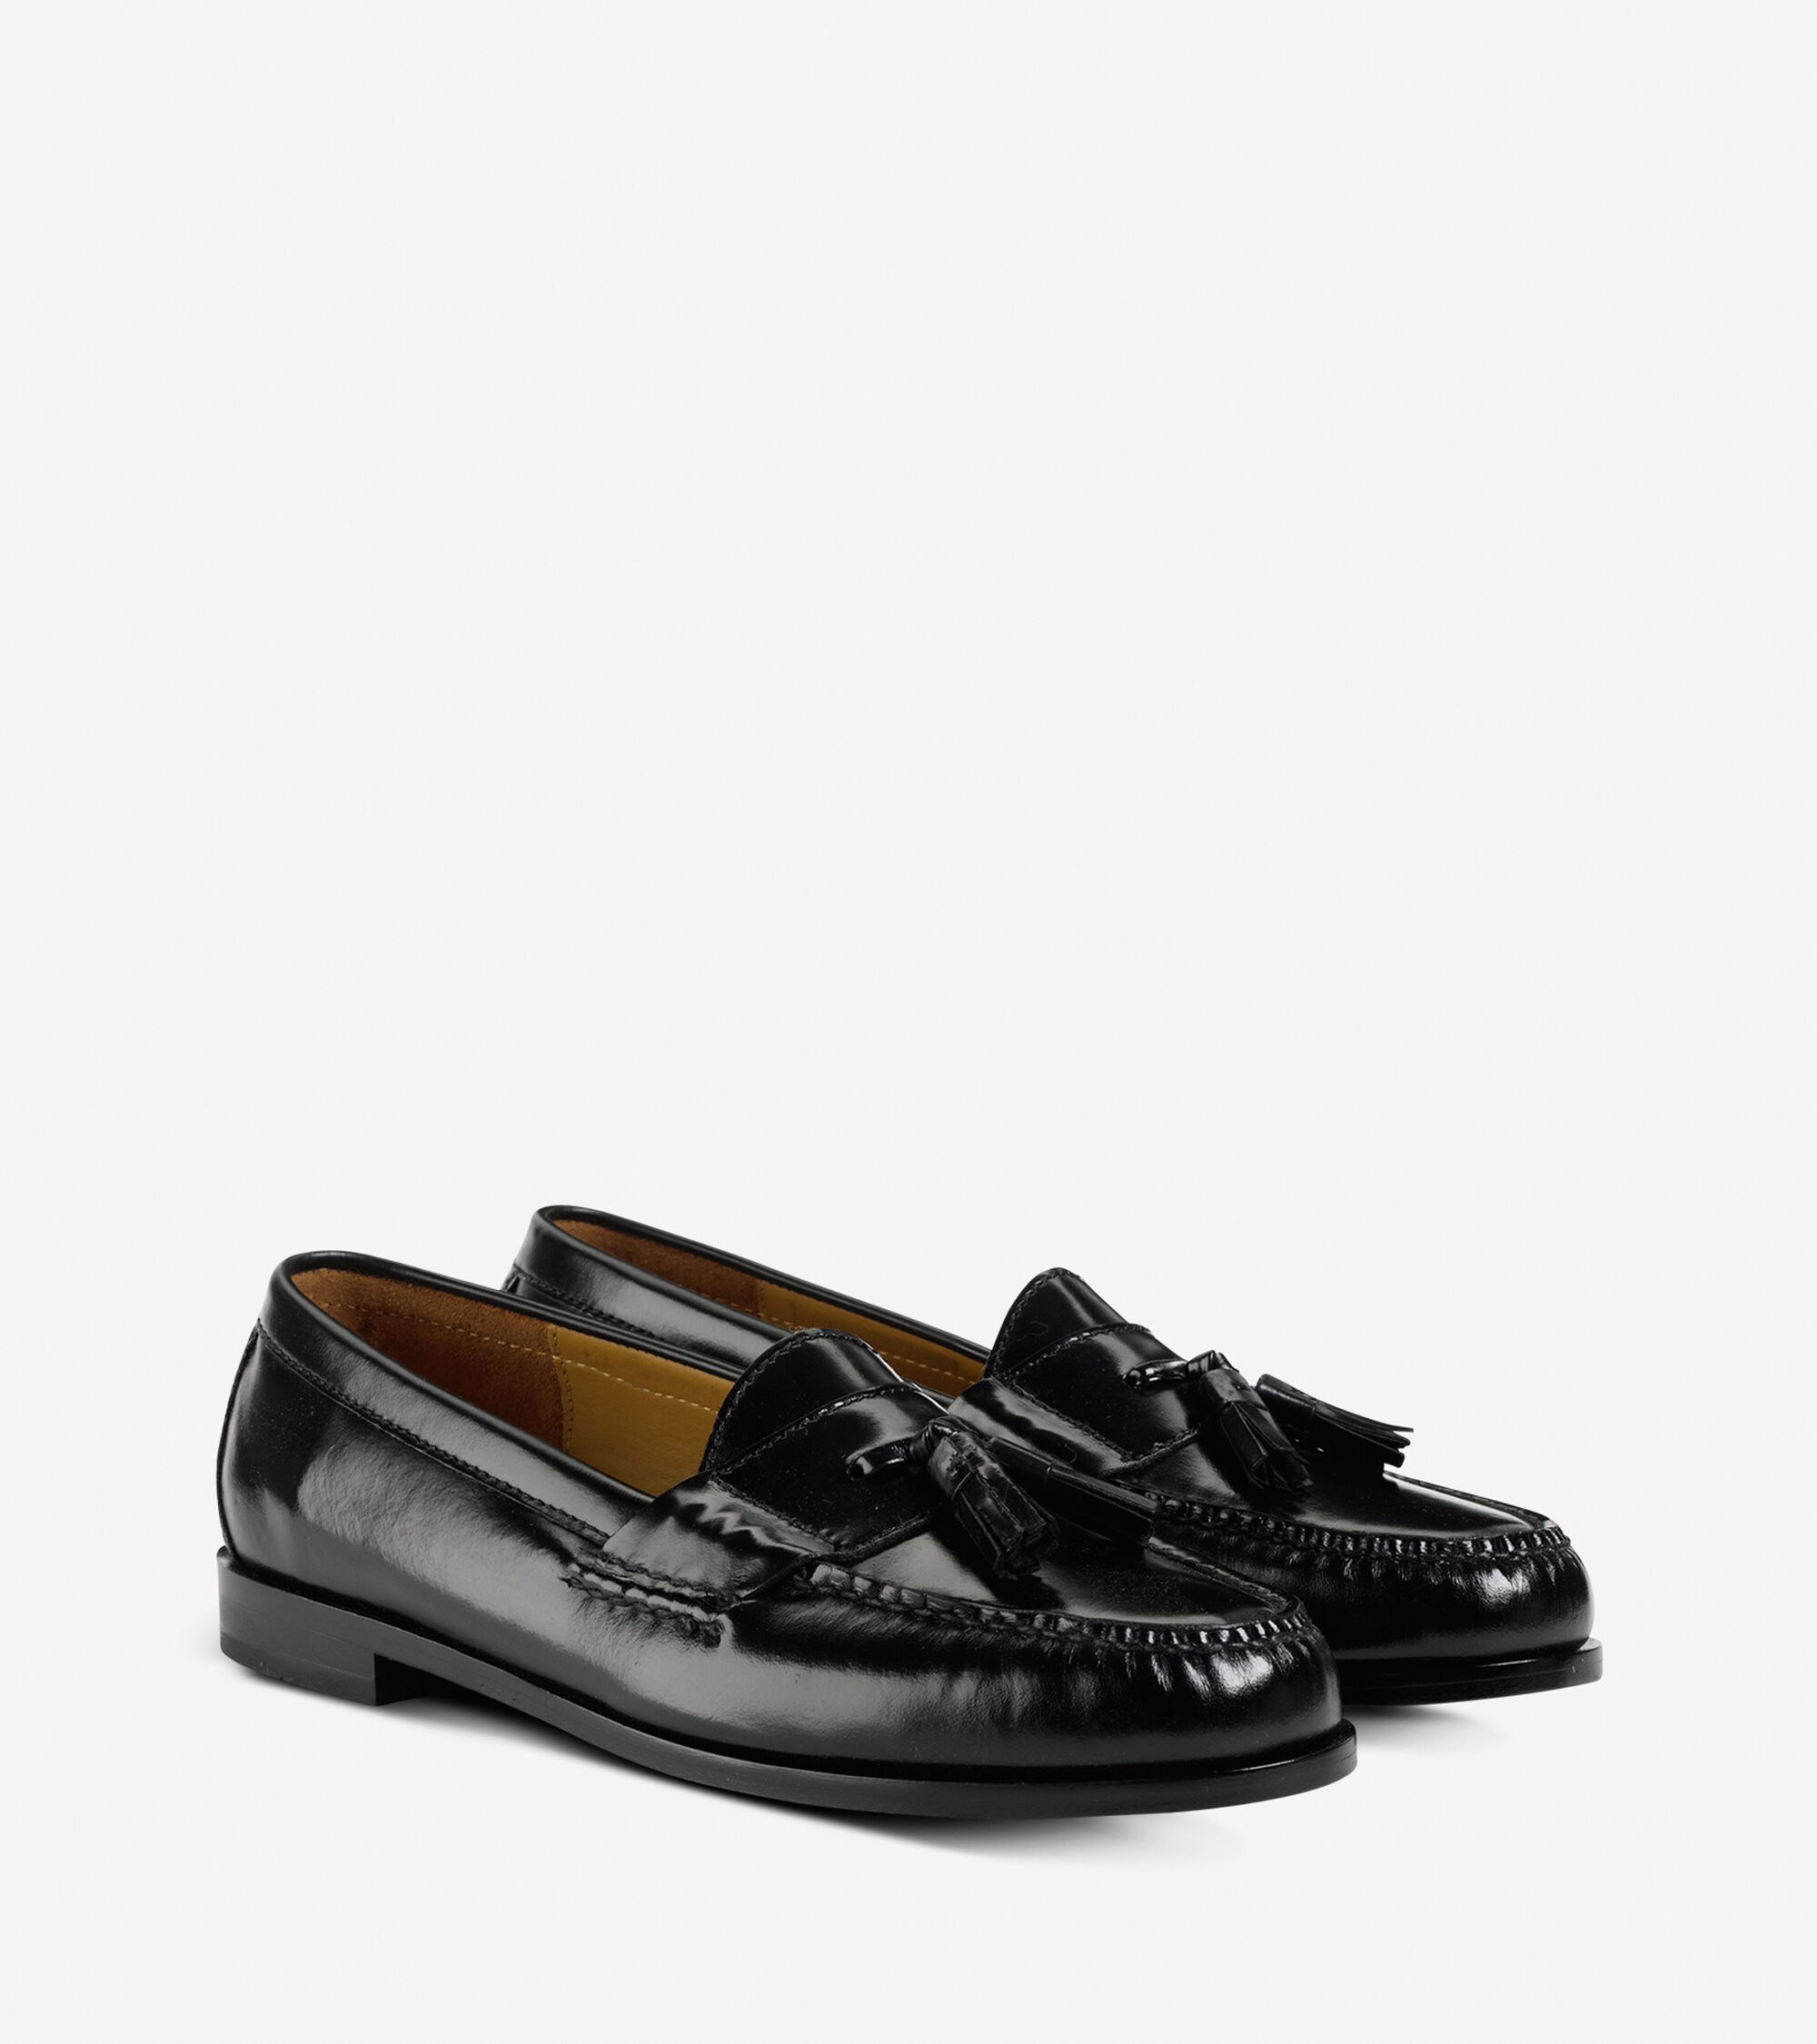 Mens Pinch Tassel Loafers In Black Cole Haan D Island Shoes Slip On Mocasine Casual Loafer